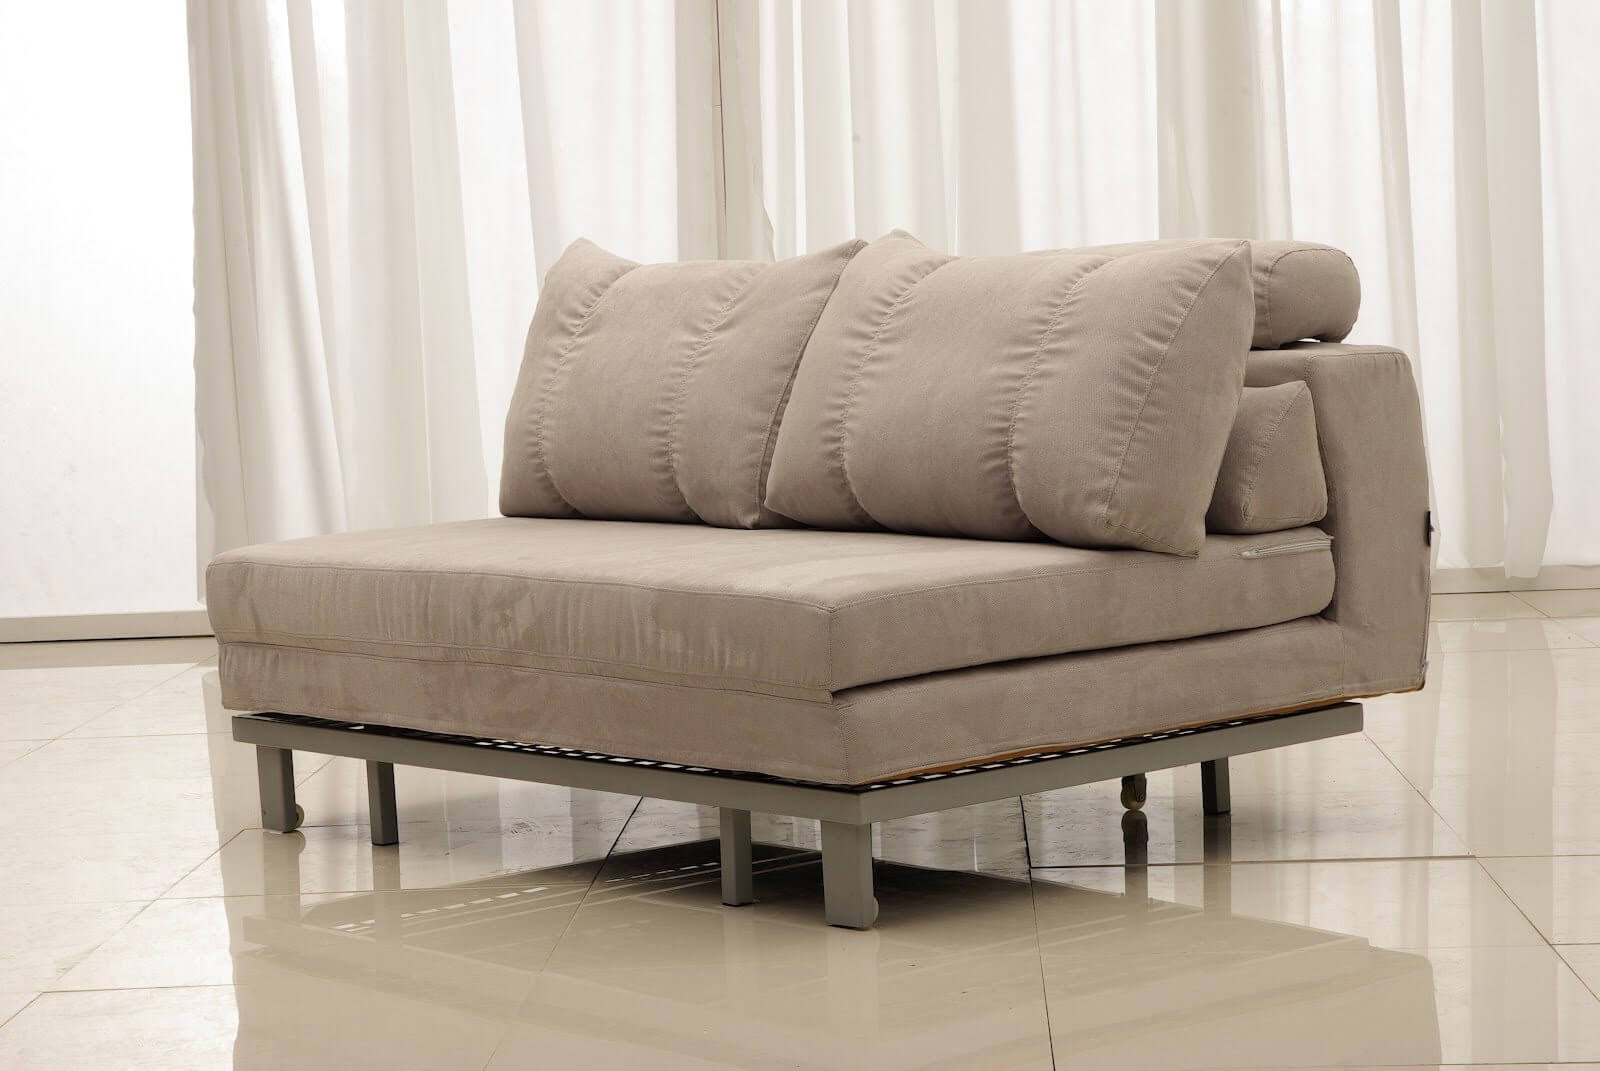 Wonderful Sleeper Sofas Ideas Hiding Cozy Furniture To With Felton Modern Style Pullout Sleeper Sofas Black (View 13 of 15)